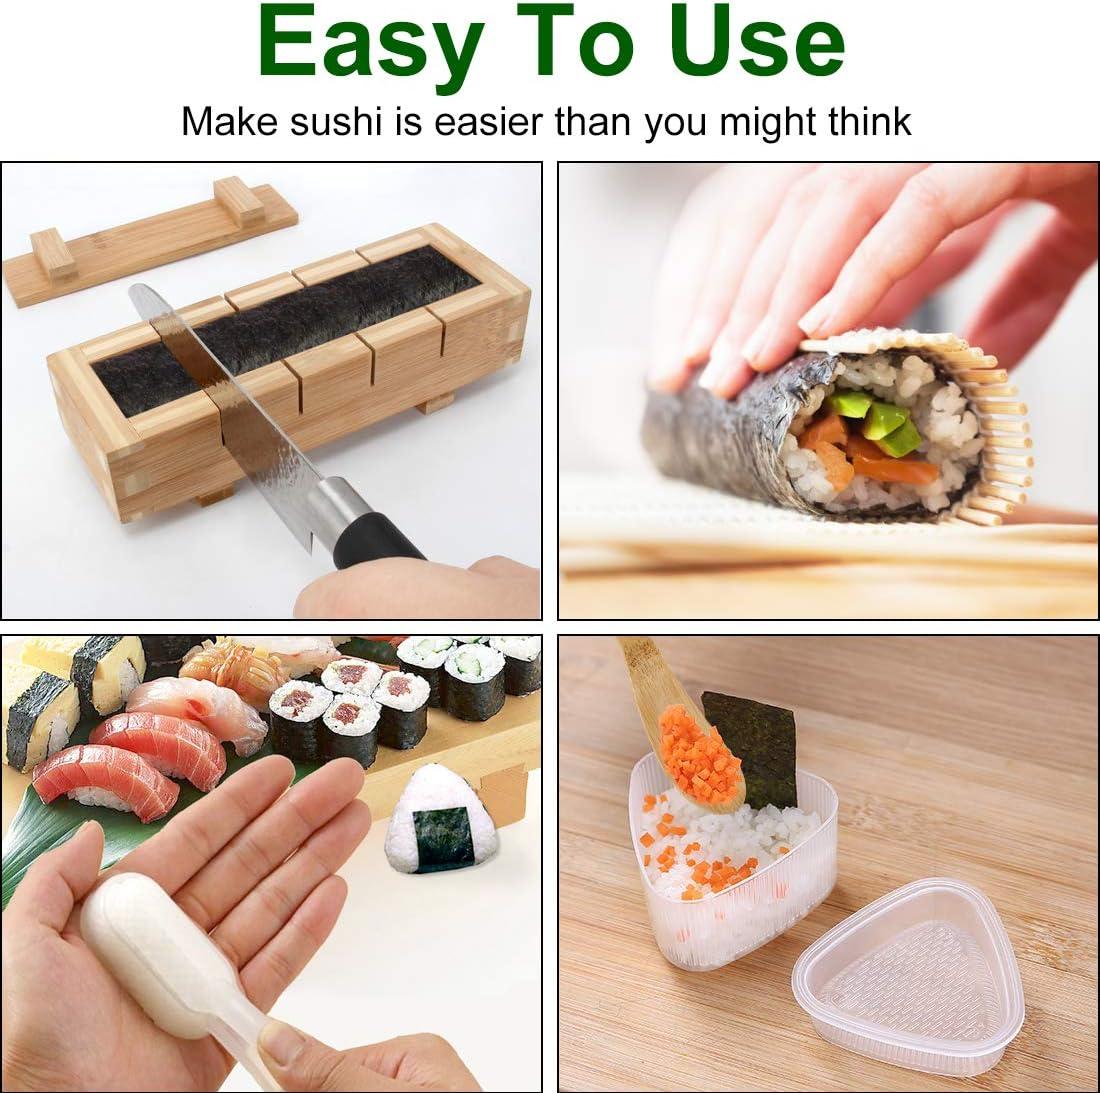 1 Warship Sushi Mold and 2 Origin Mold 12 Pics of Chopsticks kit with Storage Bag 1 Sushi Knife Bamboo Sushi Roller Kit Colovis 19 Pics Sushi Making Kit,Including 2 Sushi Mats,1 Sushi Making Mold